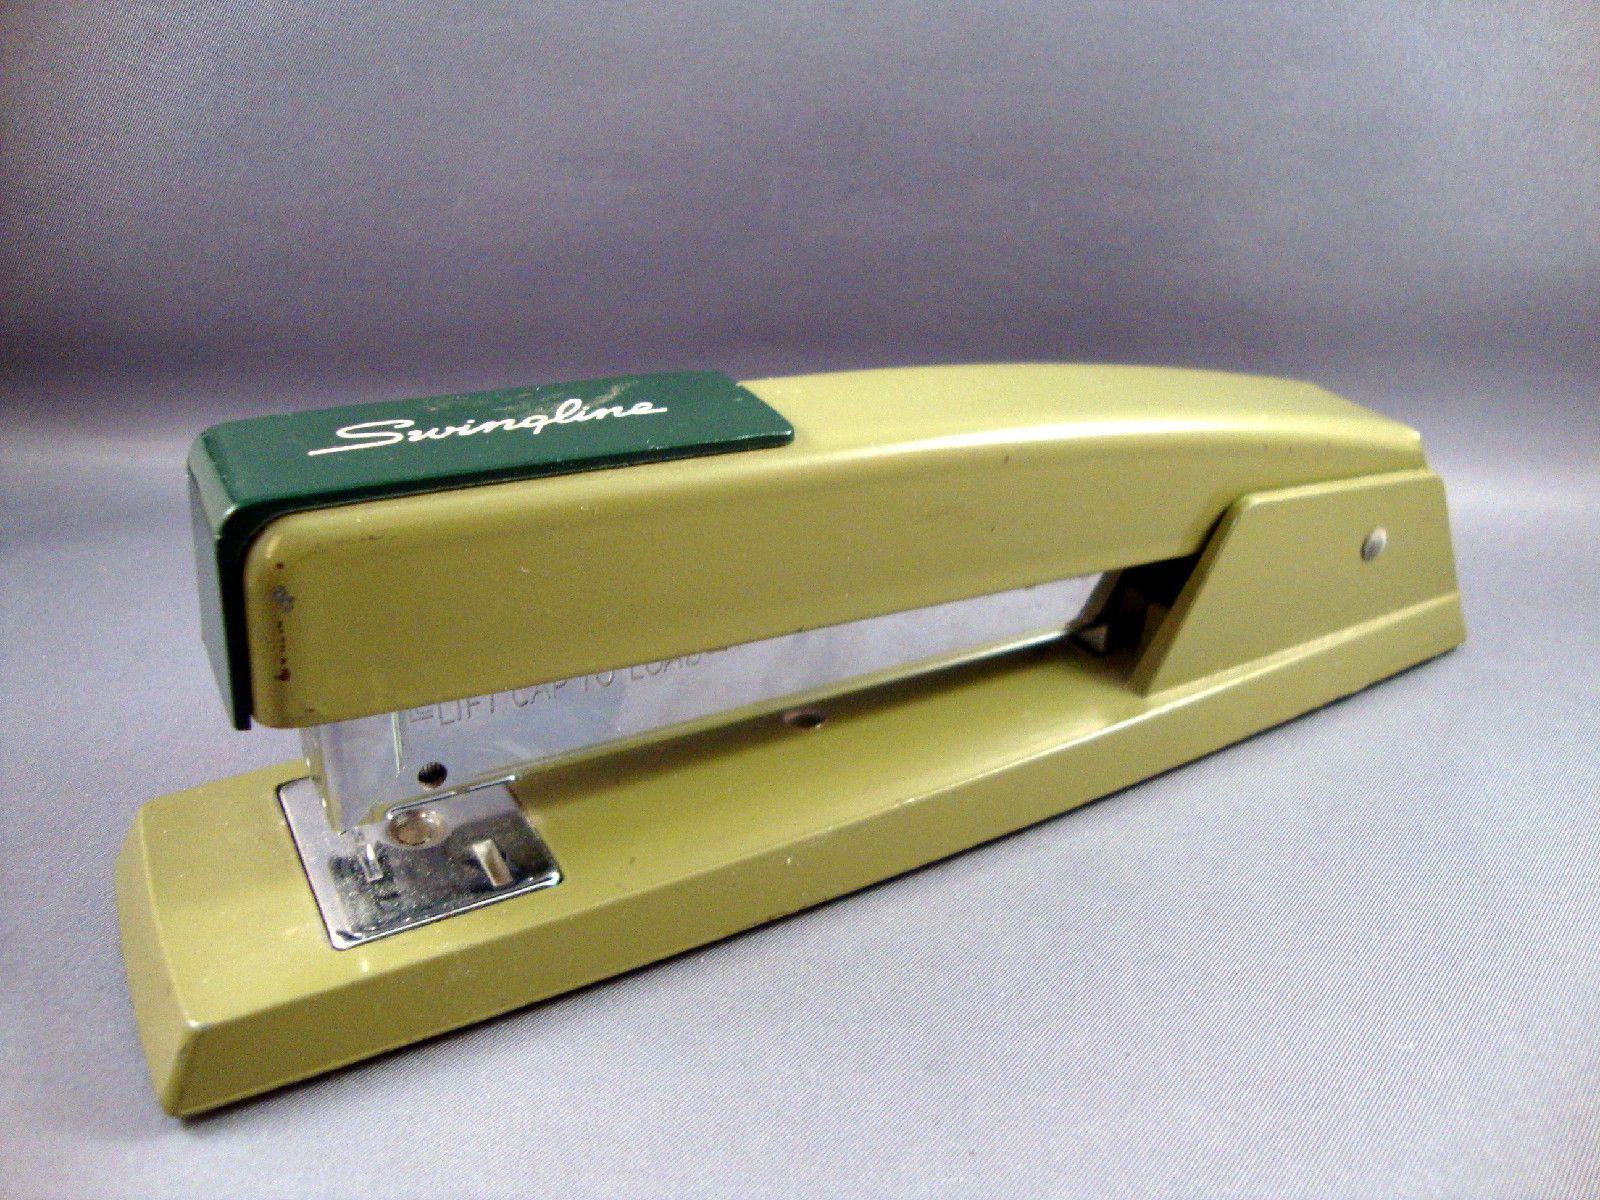 how to fix a swingline stapler 747